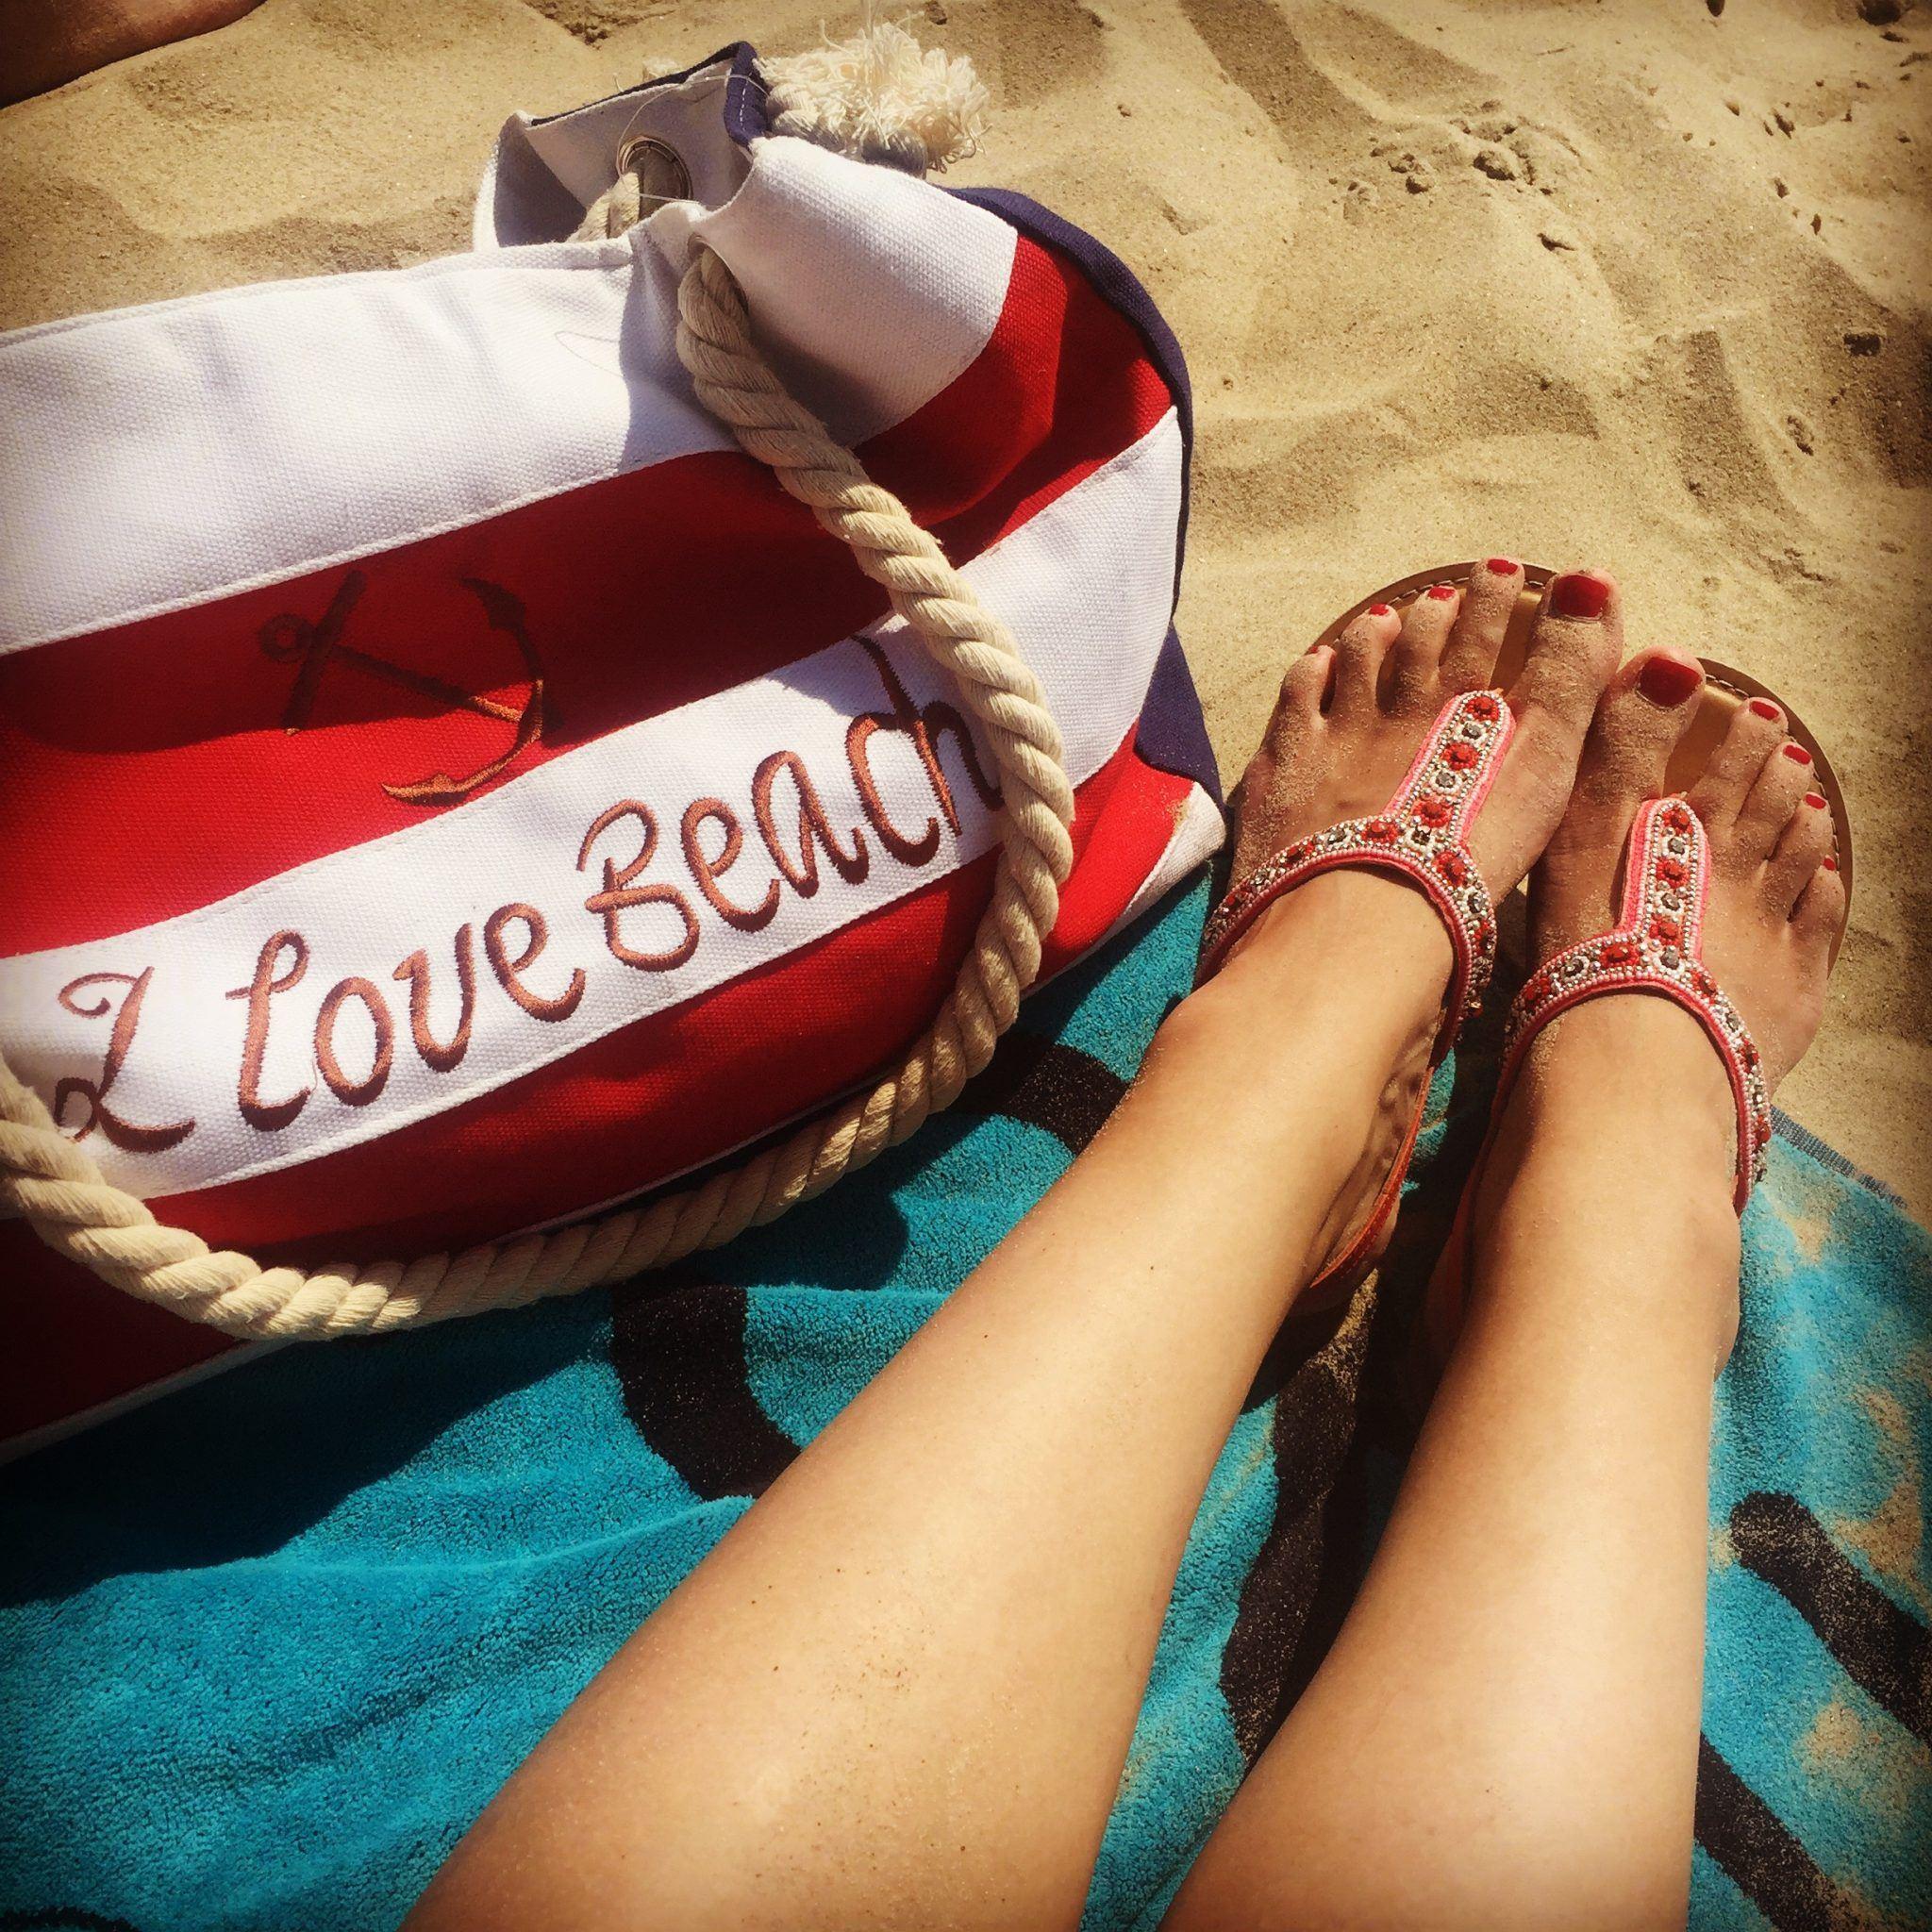 Laura's Life 4 beach